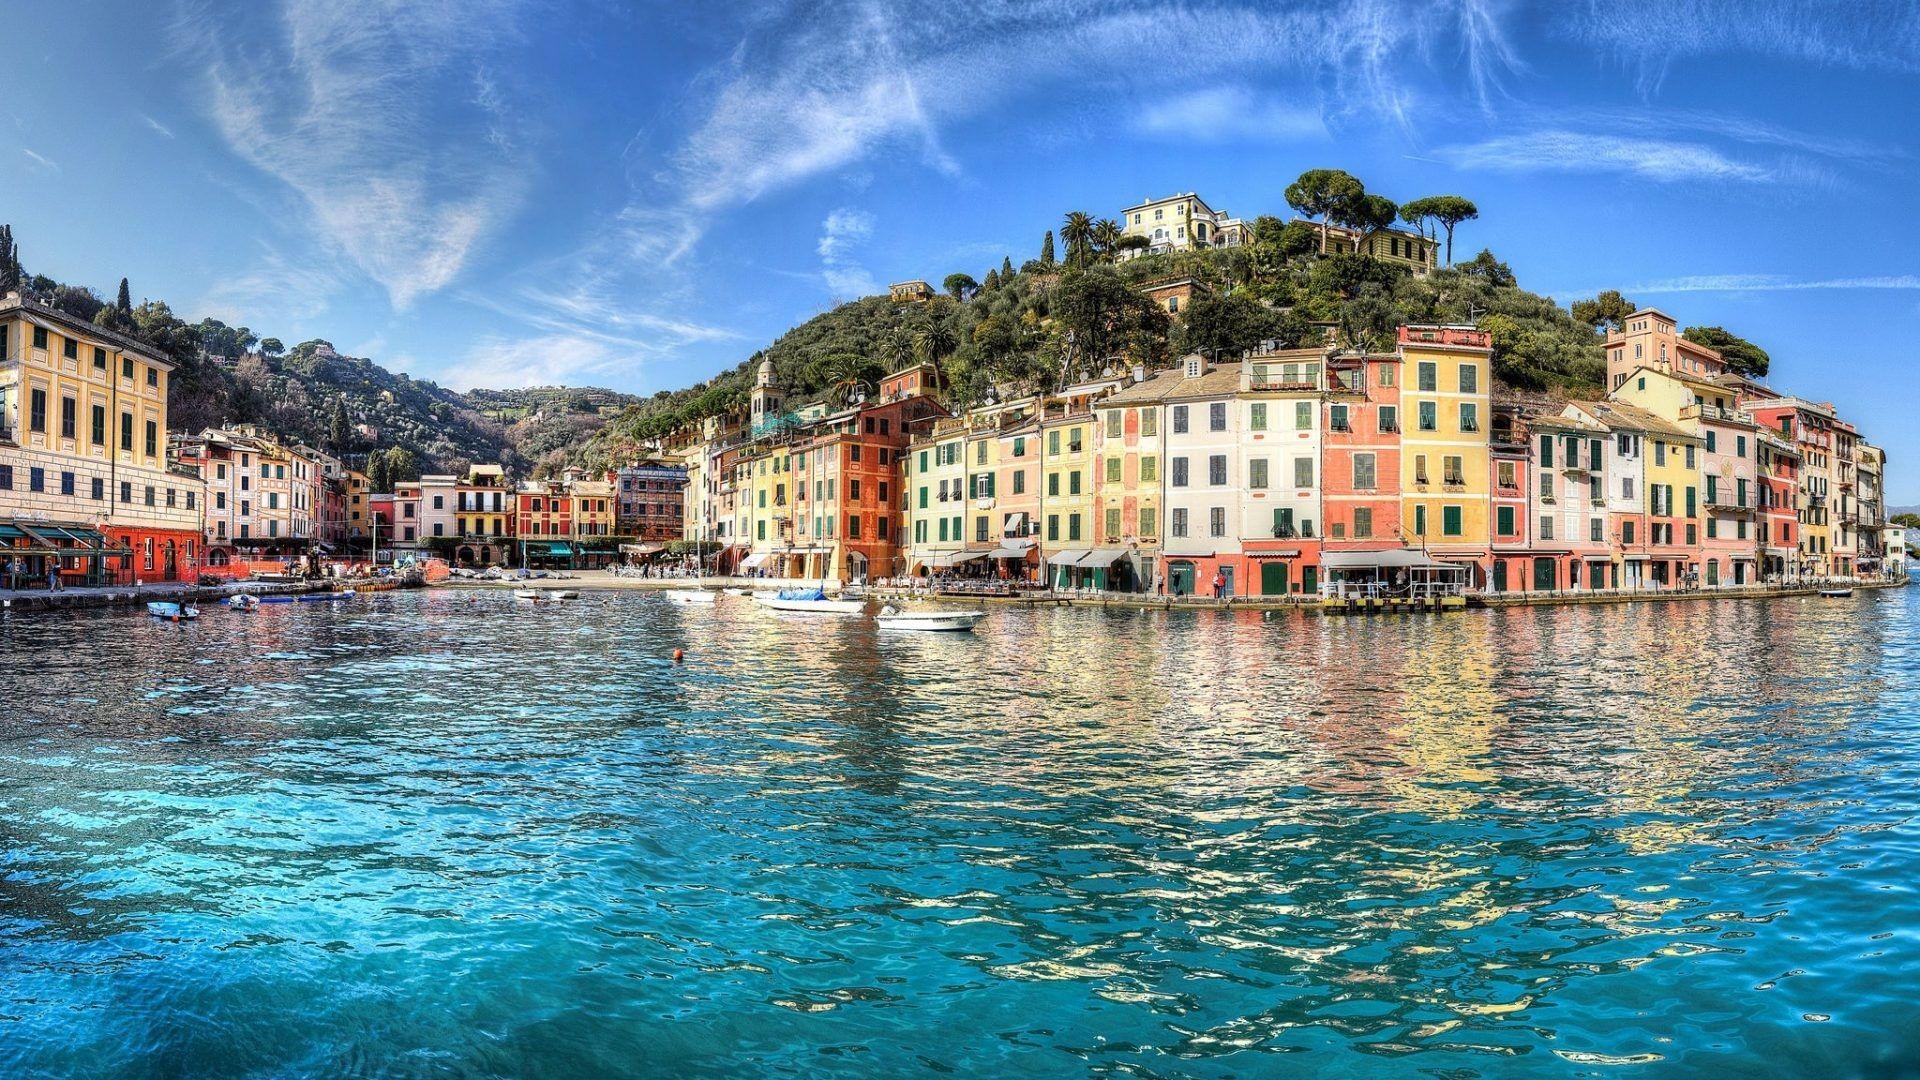 Res: 1920x1080, Portofino Italy Amalfi Coast Liguria Houses Mediterranean Sea Free Desktop  Wallpaper